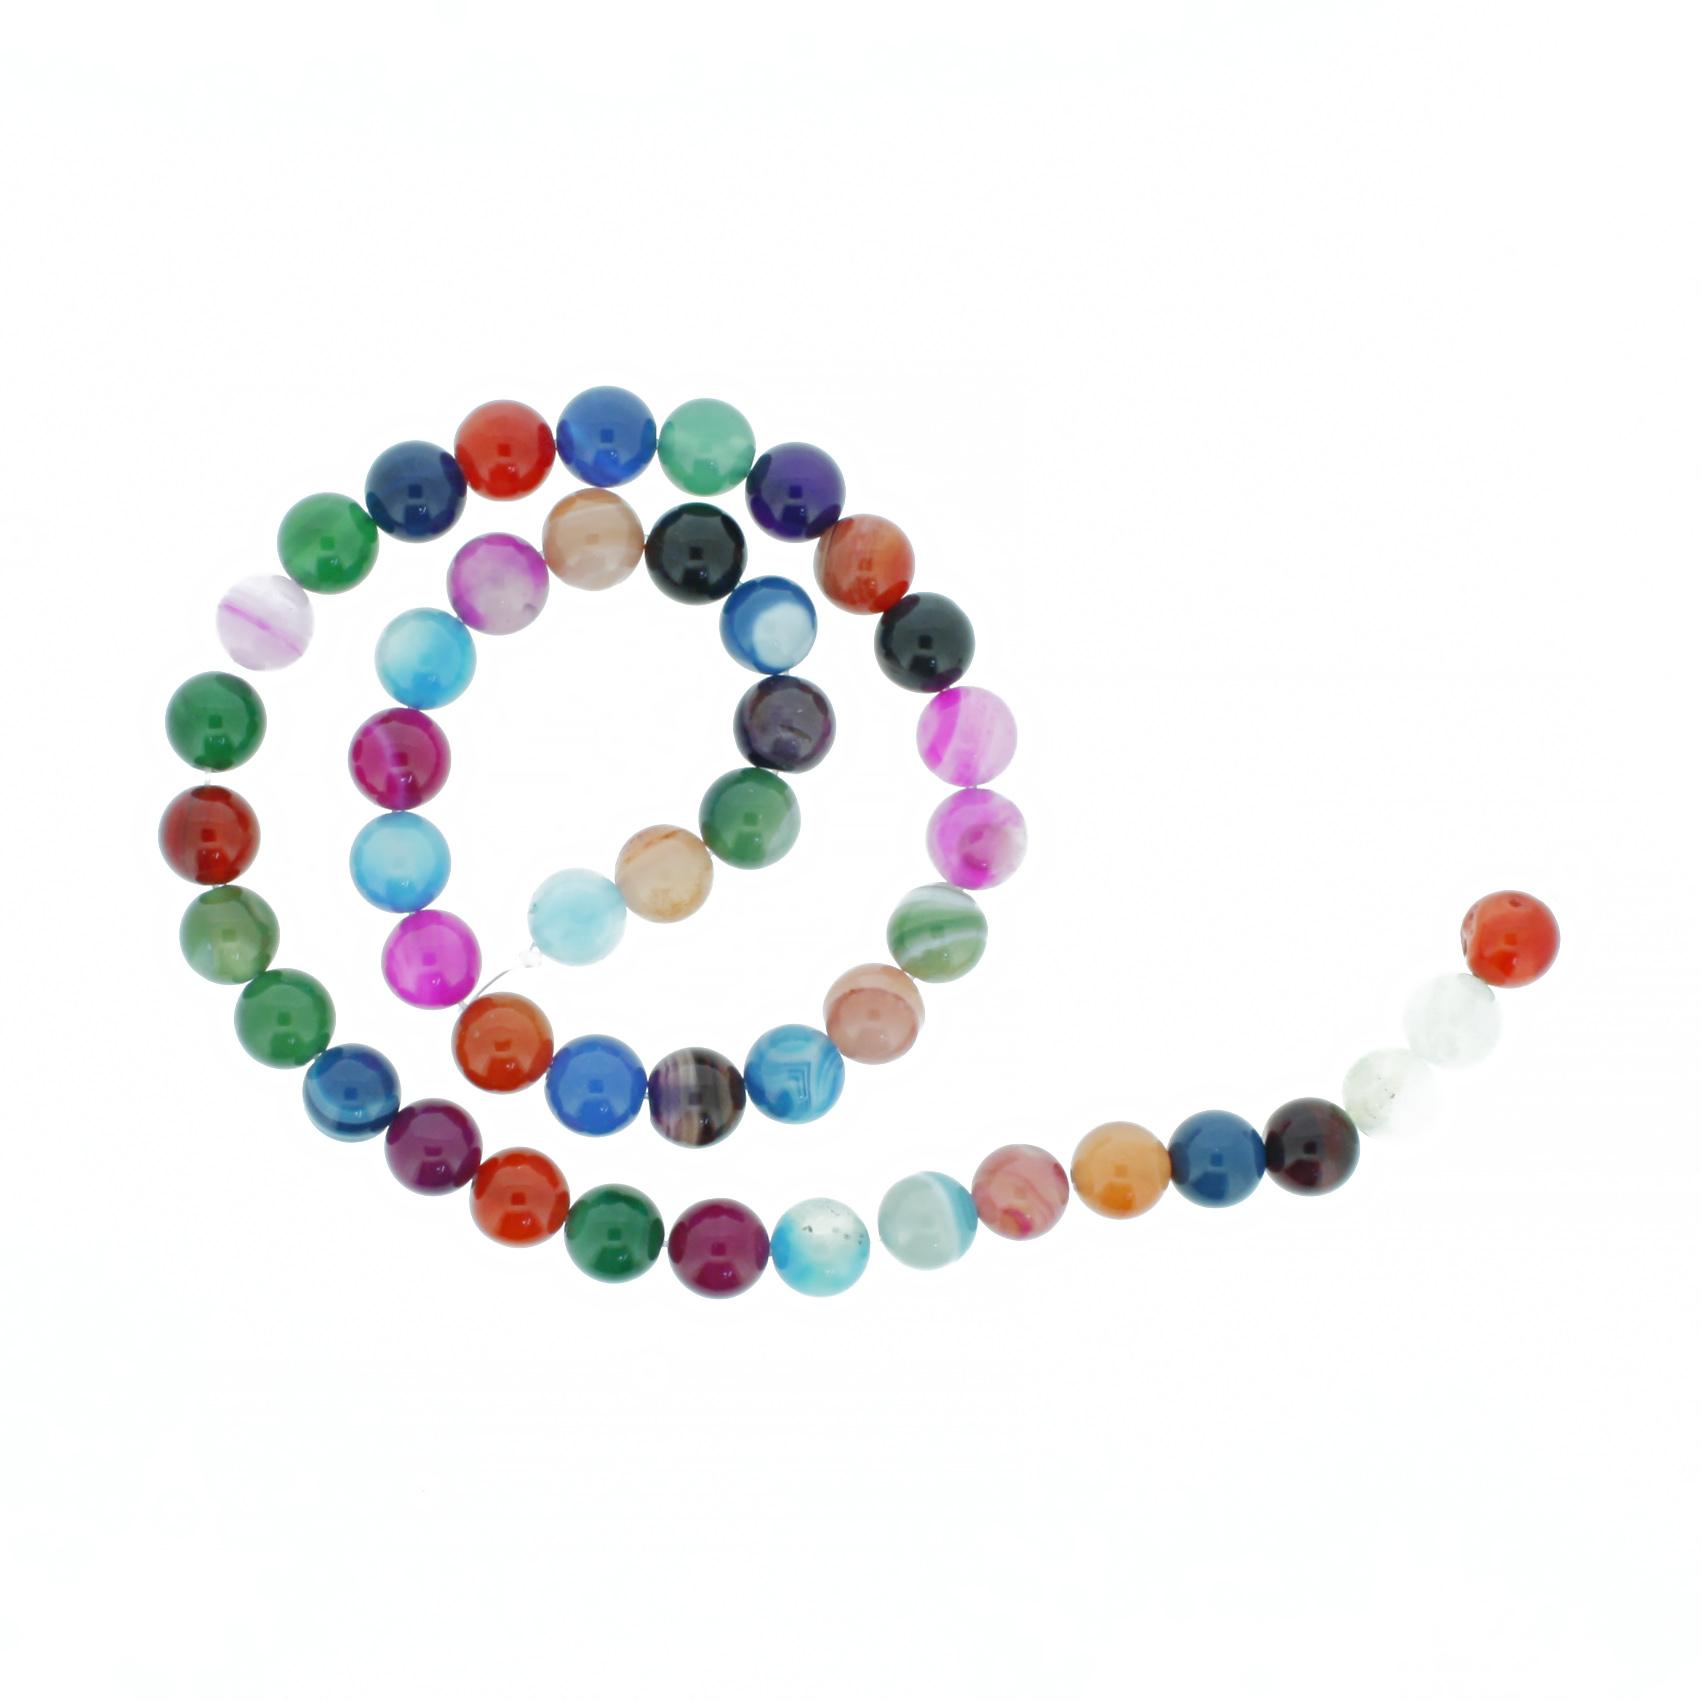 Fio de Pedra - Ágata Mix - 8mm  - Stéphanie Bijoux® - Peças para Bijuterias e Artesanato